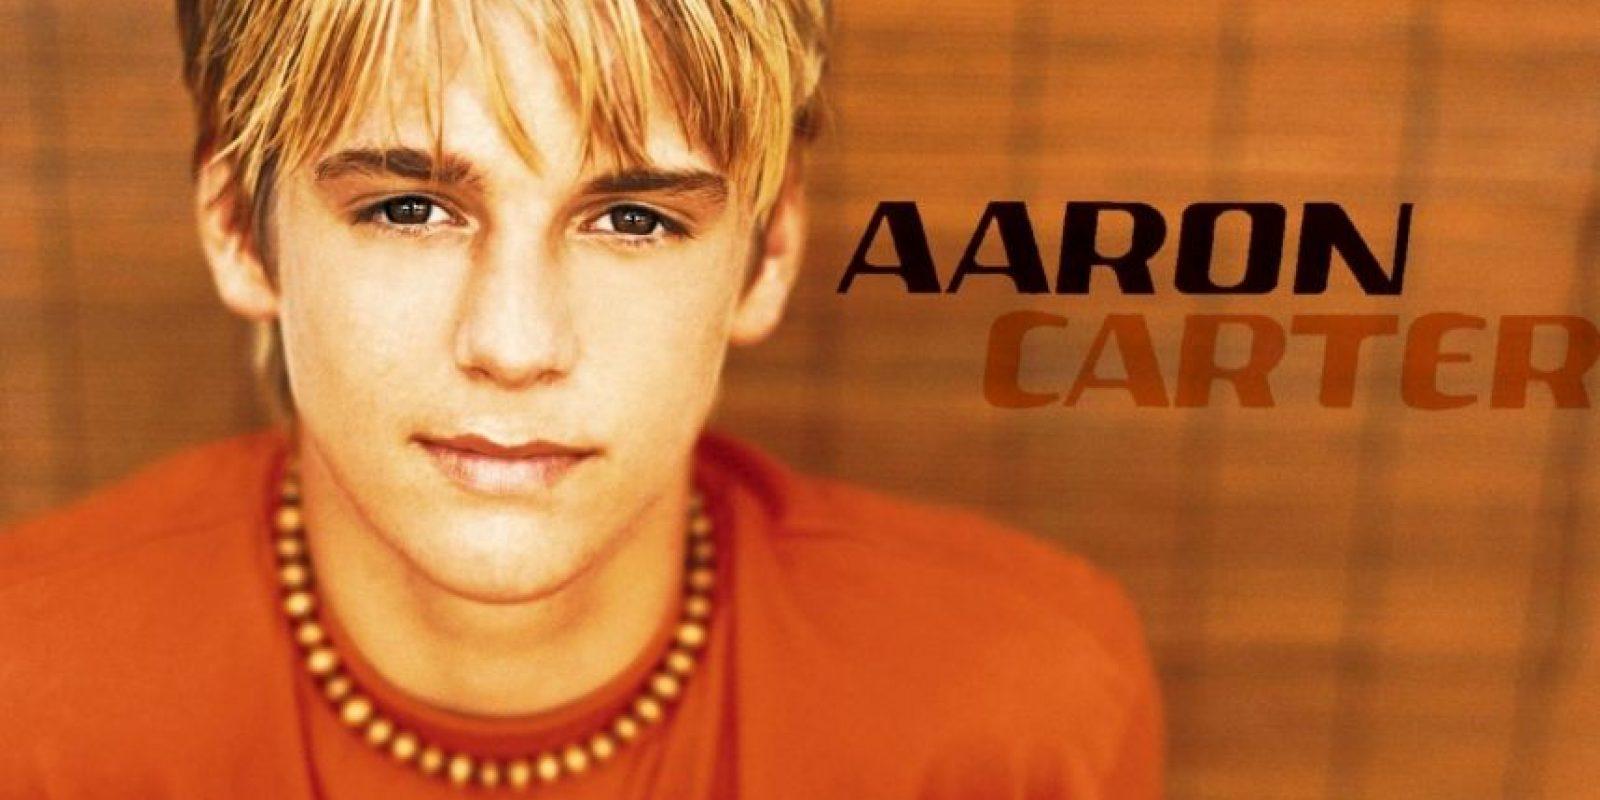 Apareció en 1997, en un recital de los Backstreet Boys en Berlín. Foto:vía Tumblr